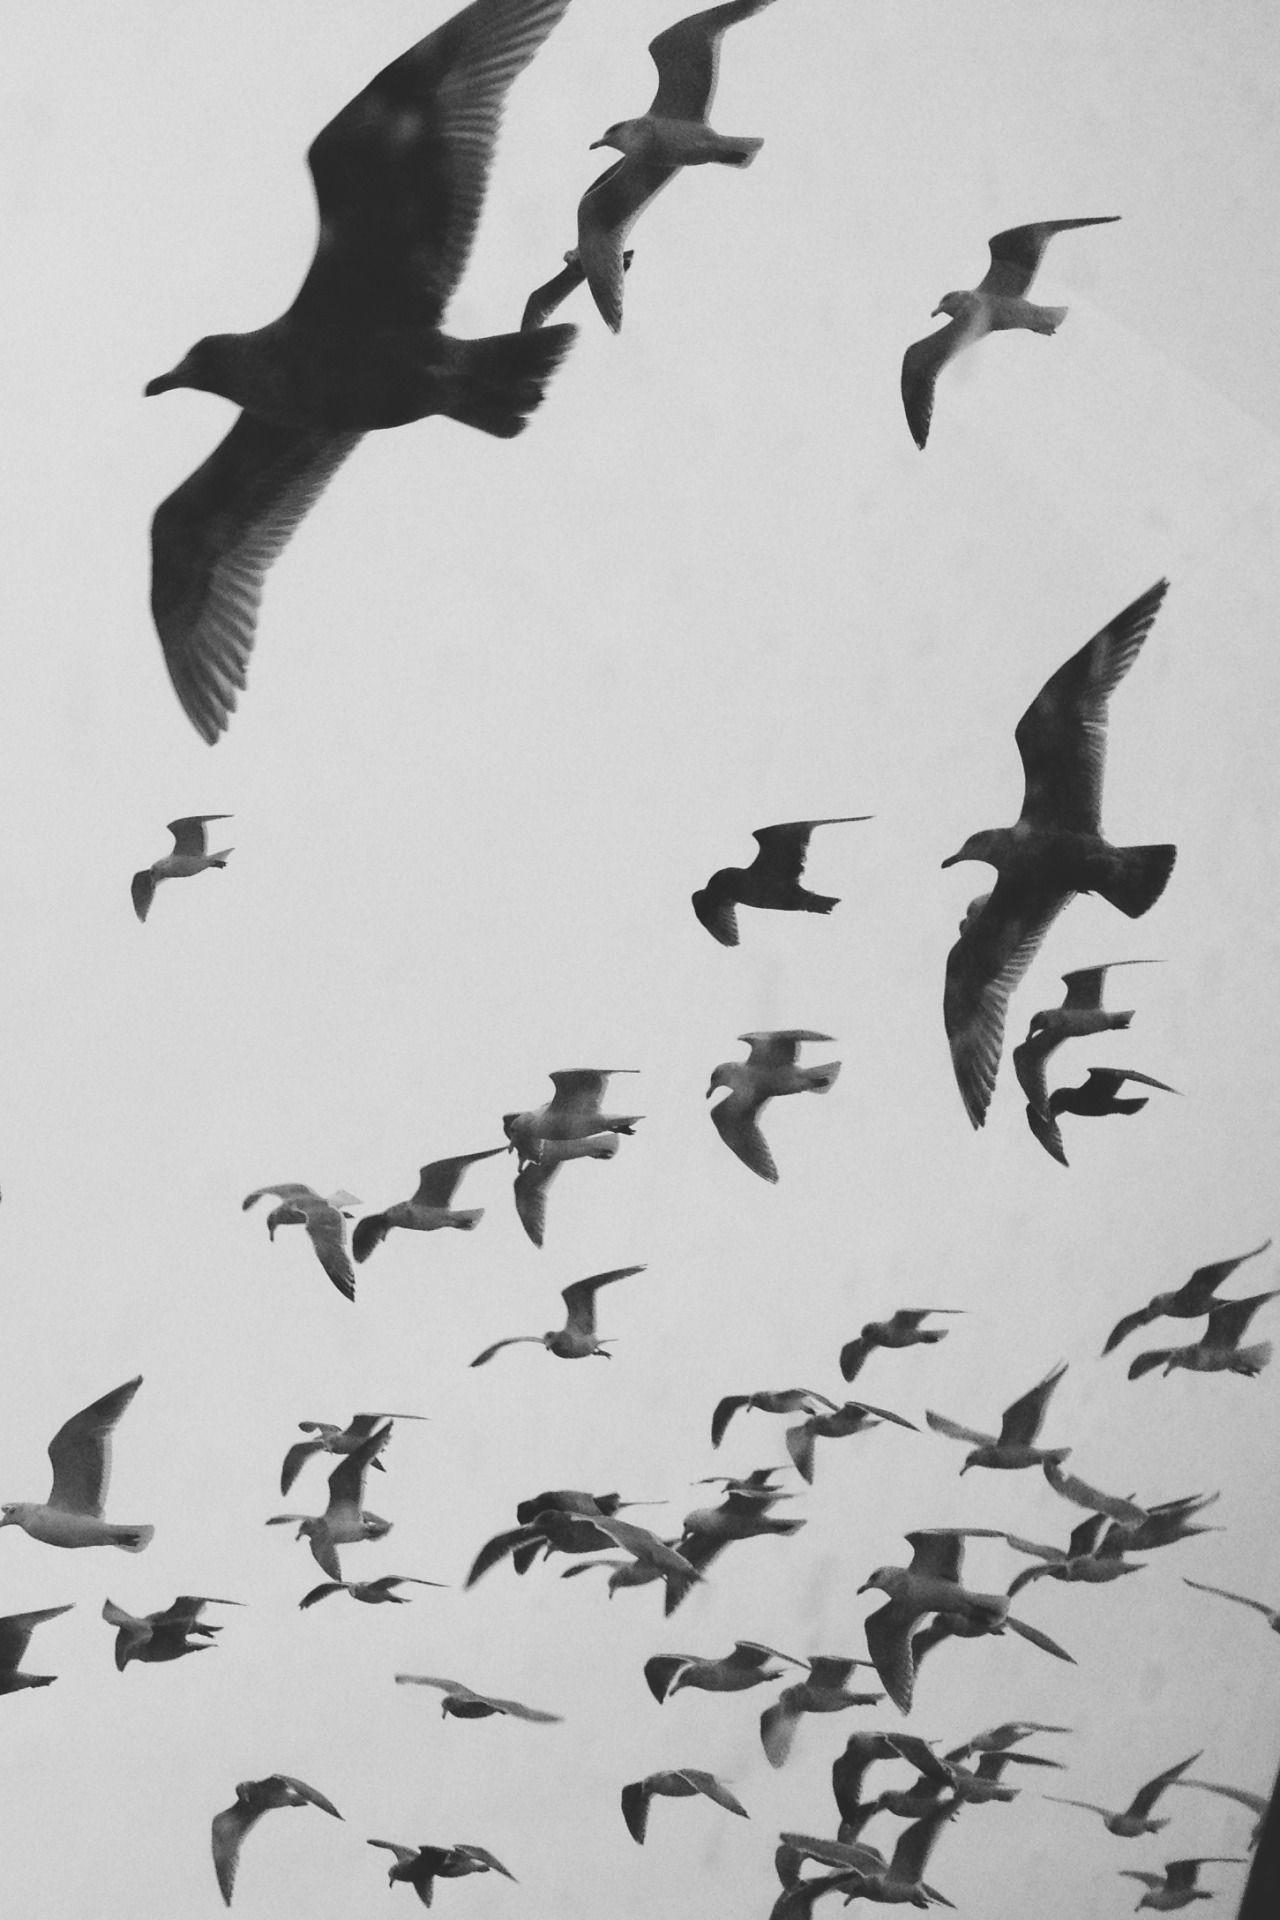 Frankly Esoteric Photo Birds Flying Bird Wallpaper Birds In The Sky